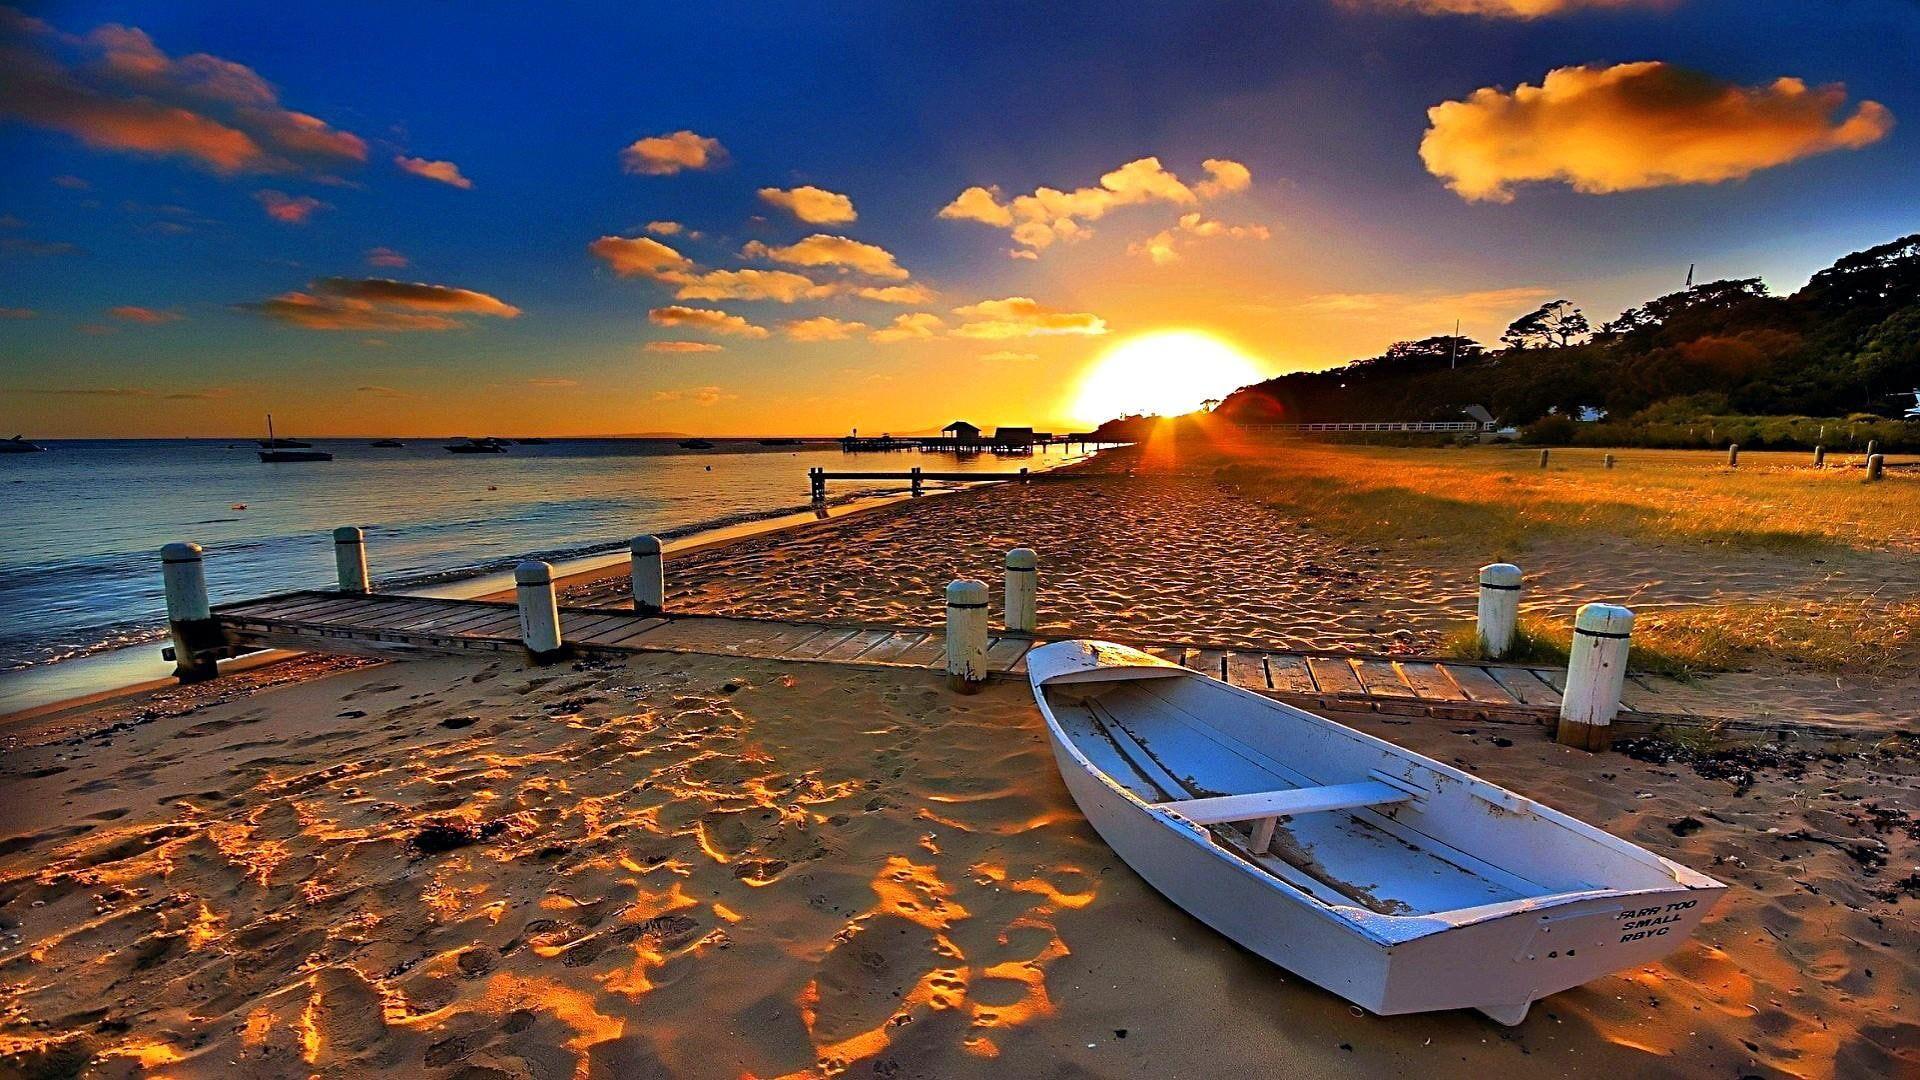 Sky Sunset Shore Sea Horizon Cloud Water Sunray Coast Beach Evening Ocean Australia 1080p Beach Sunset Wallpaper Beach Wallpaper Sunset Wallpaper